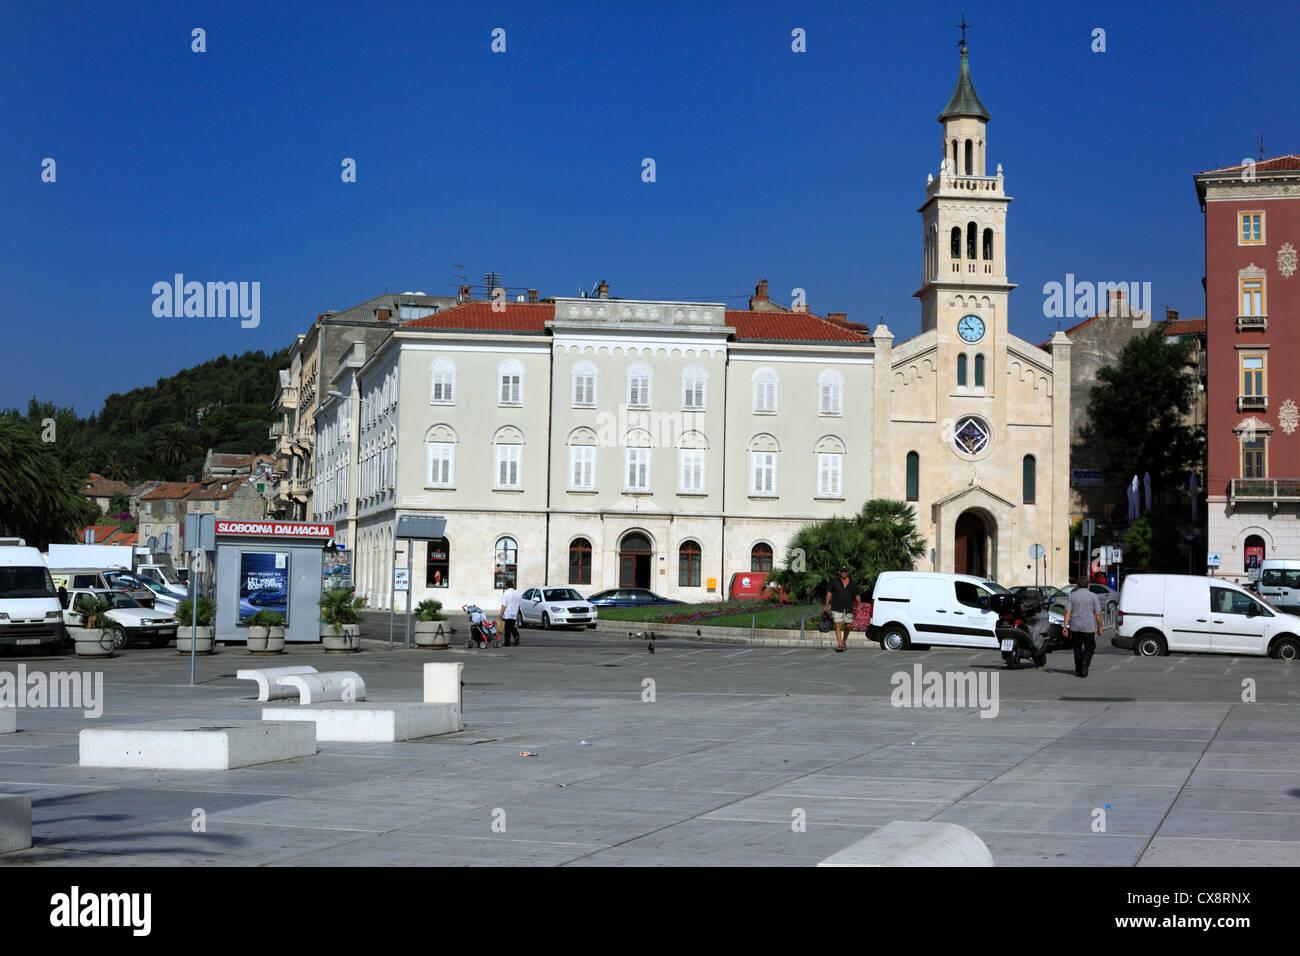 Church Of Saint Francis  Split  Dalmatia  Croatia Stock Photo  Royalty Free Image  50596054